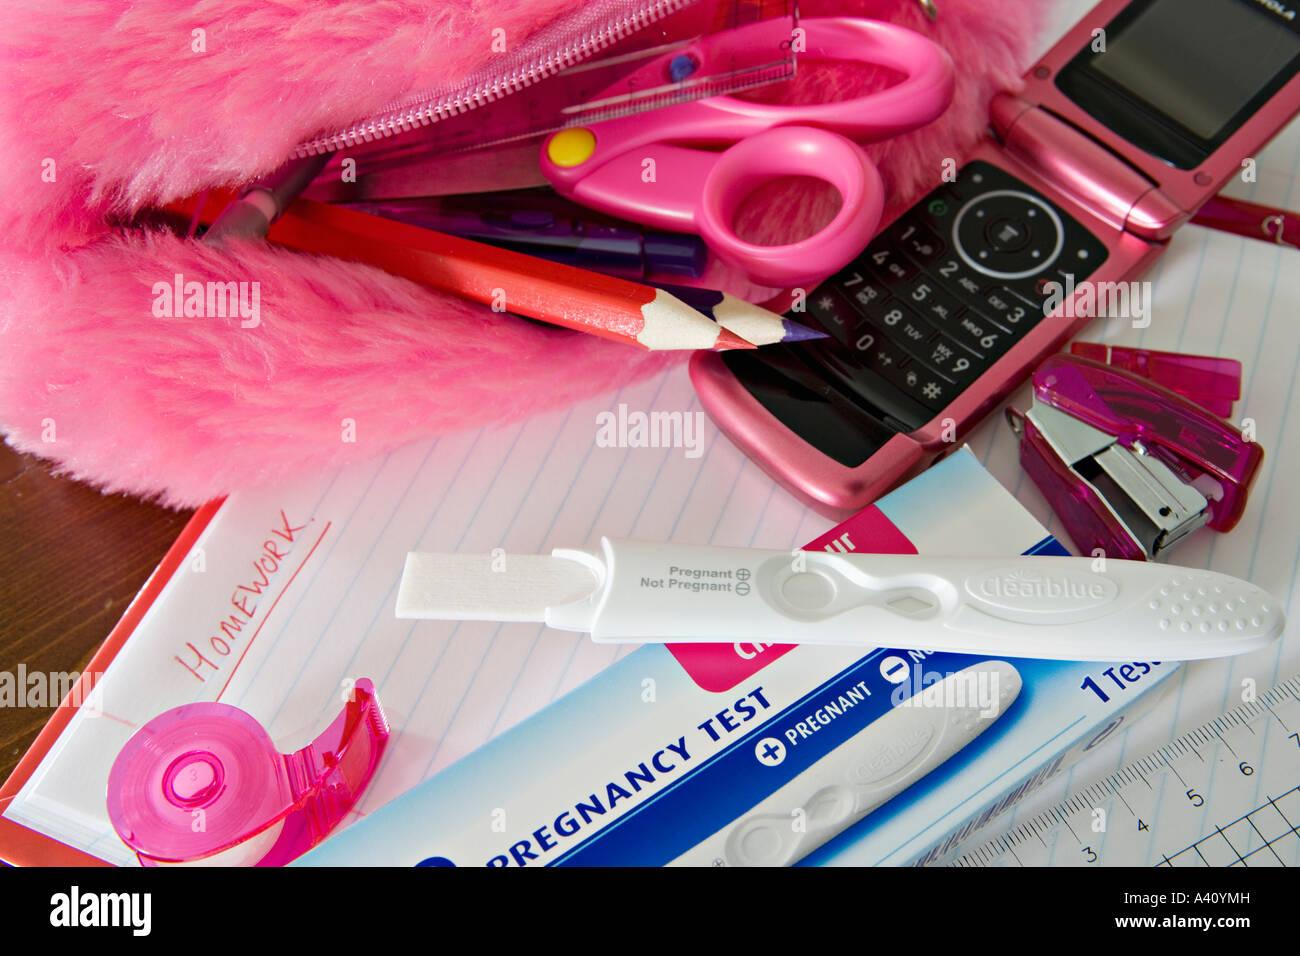 Pregnancy testing kit amongst contents of schoolgirl pencil case - Stock Image